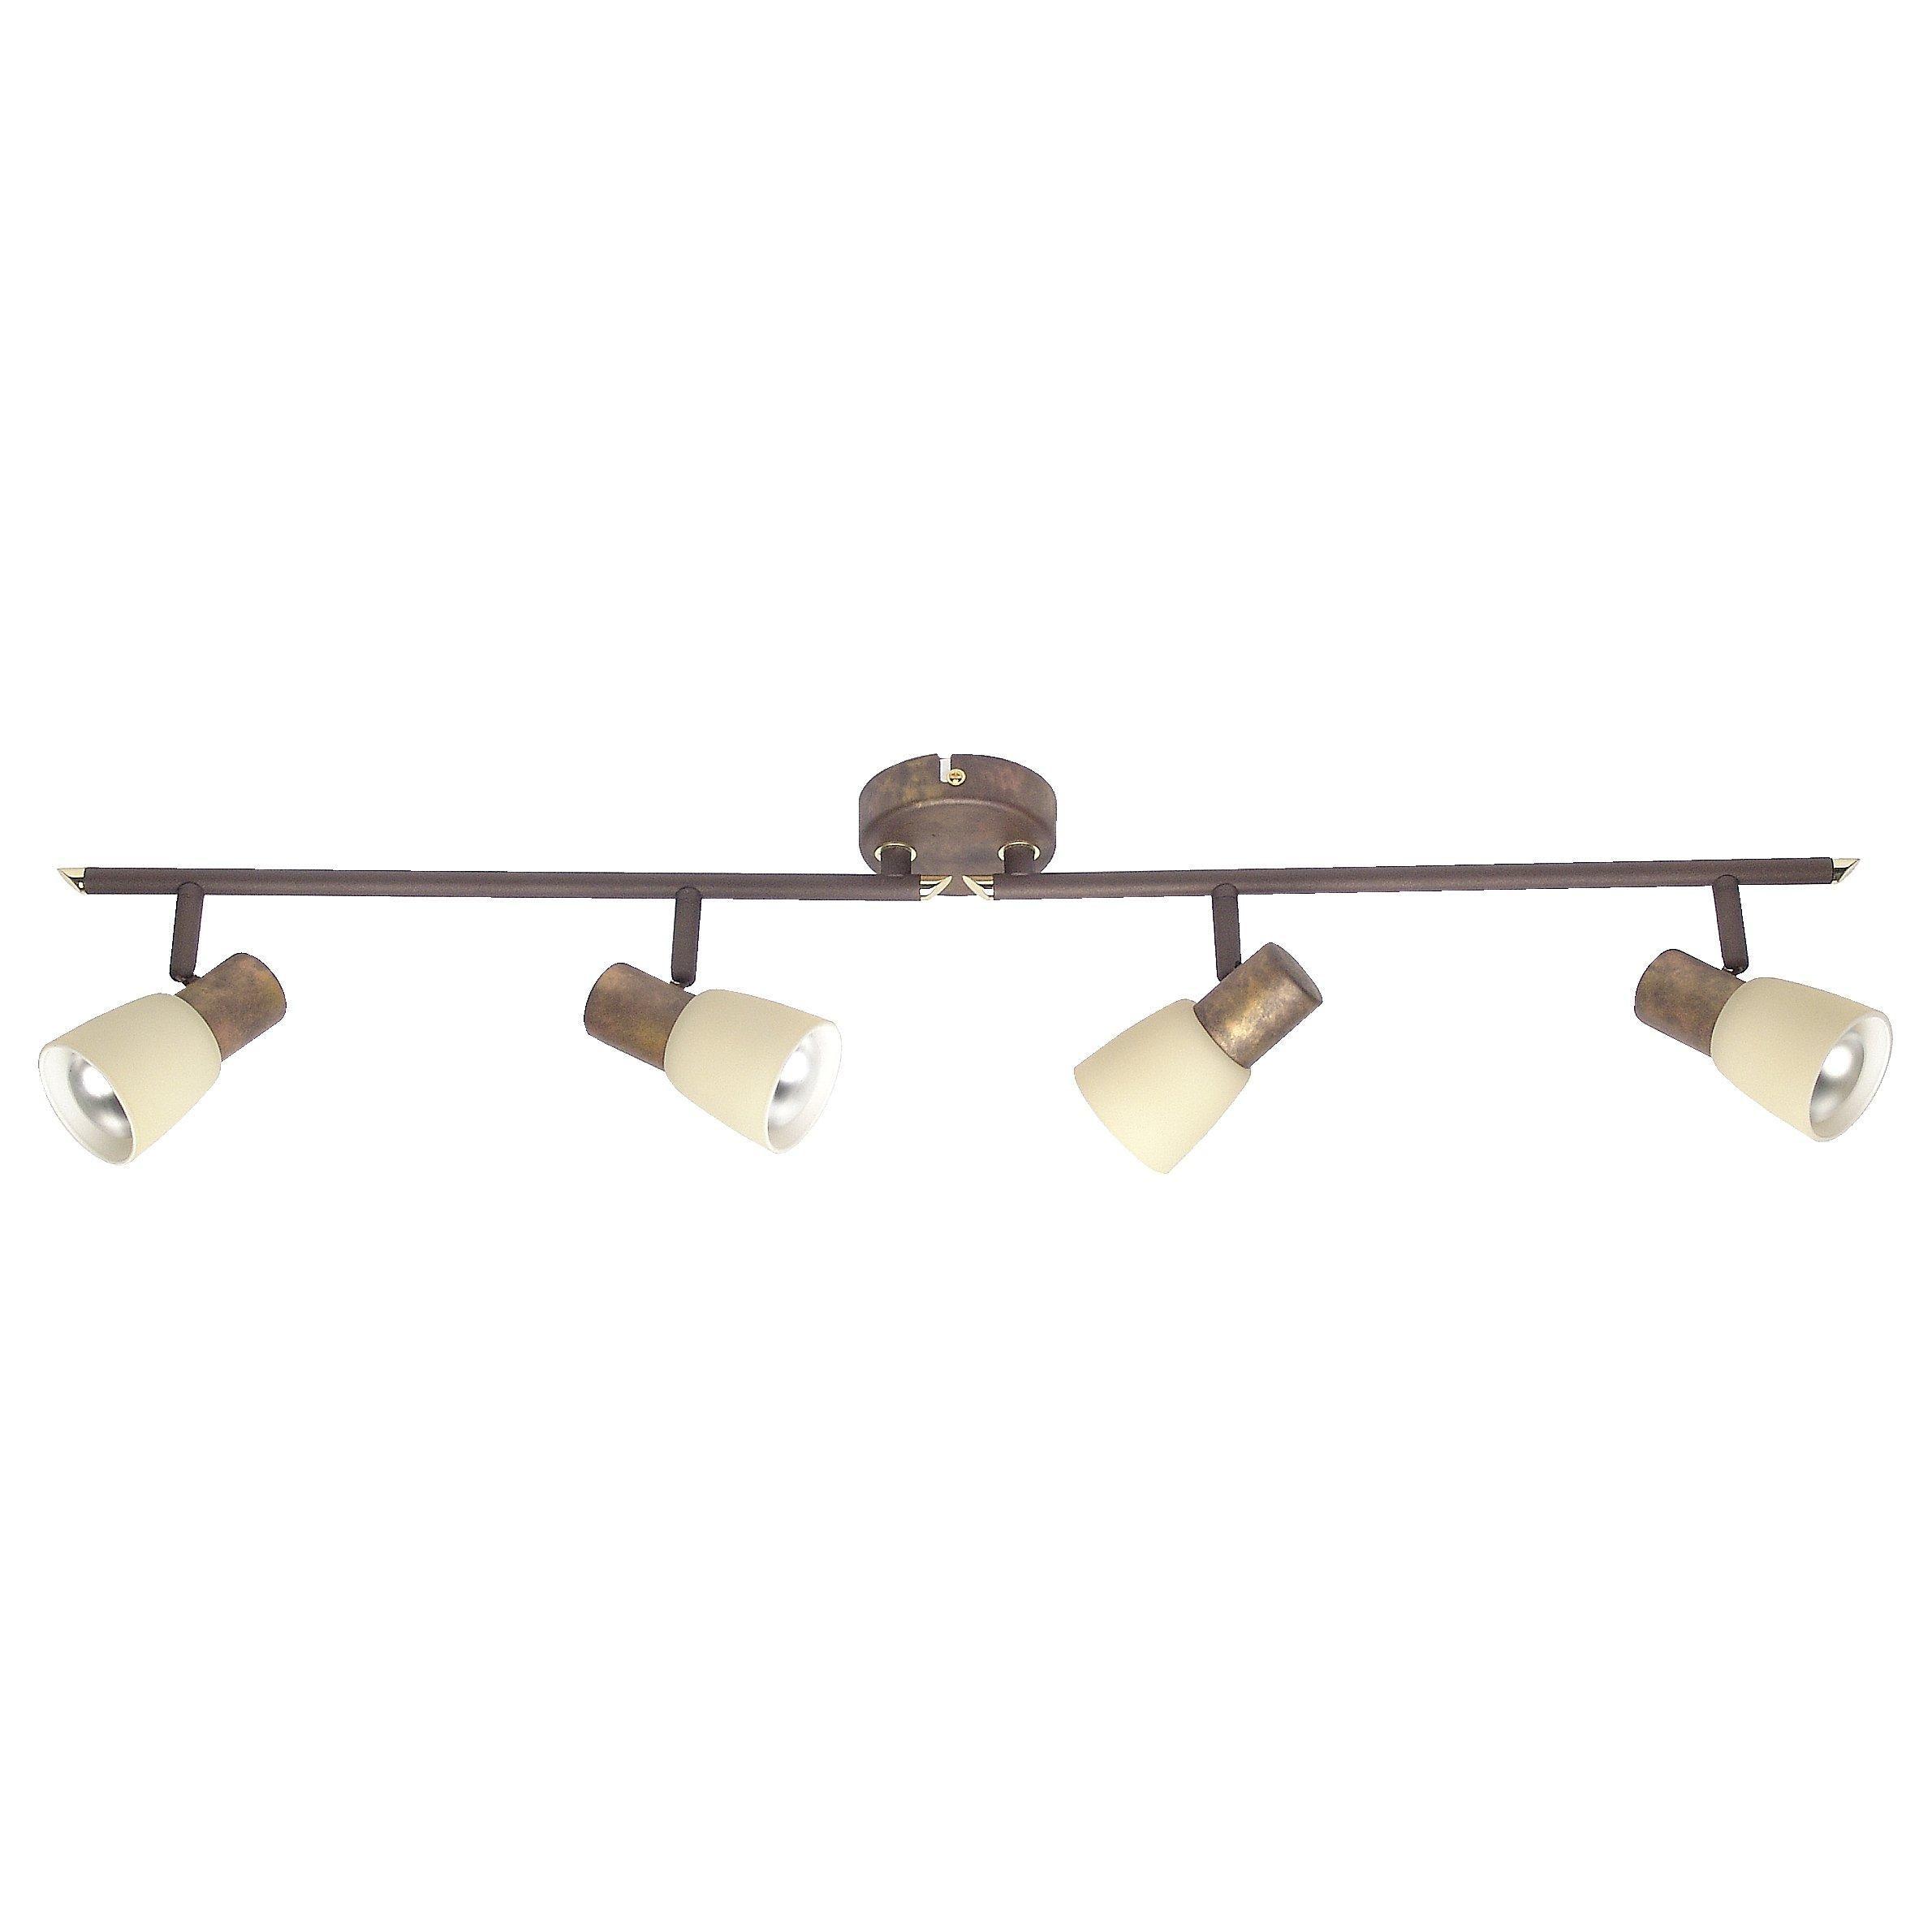 Badezimmerspiegel Beleuchtung Deckenlampe Flur Design Led